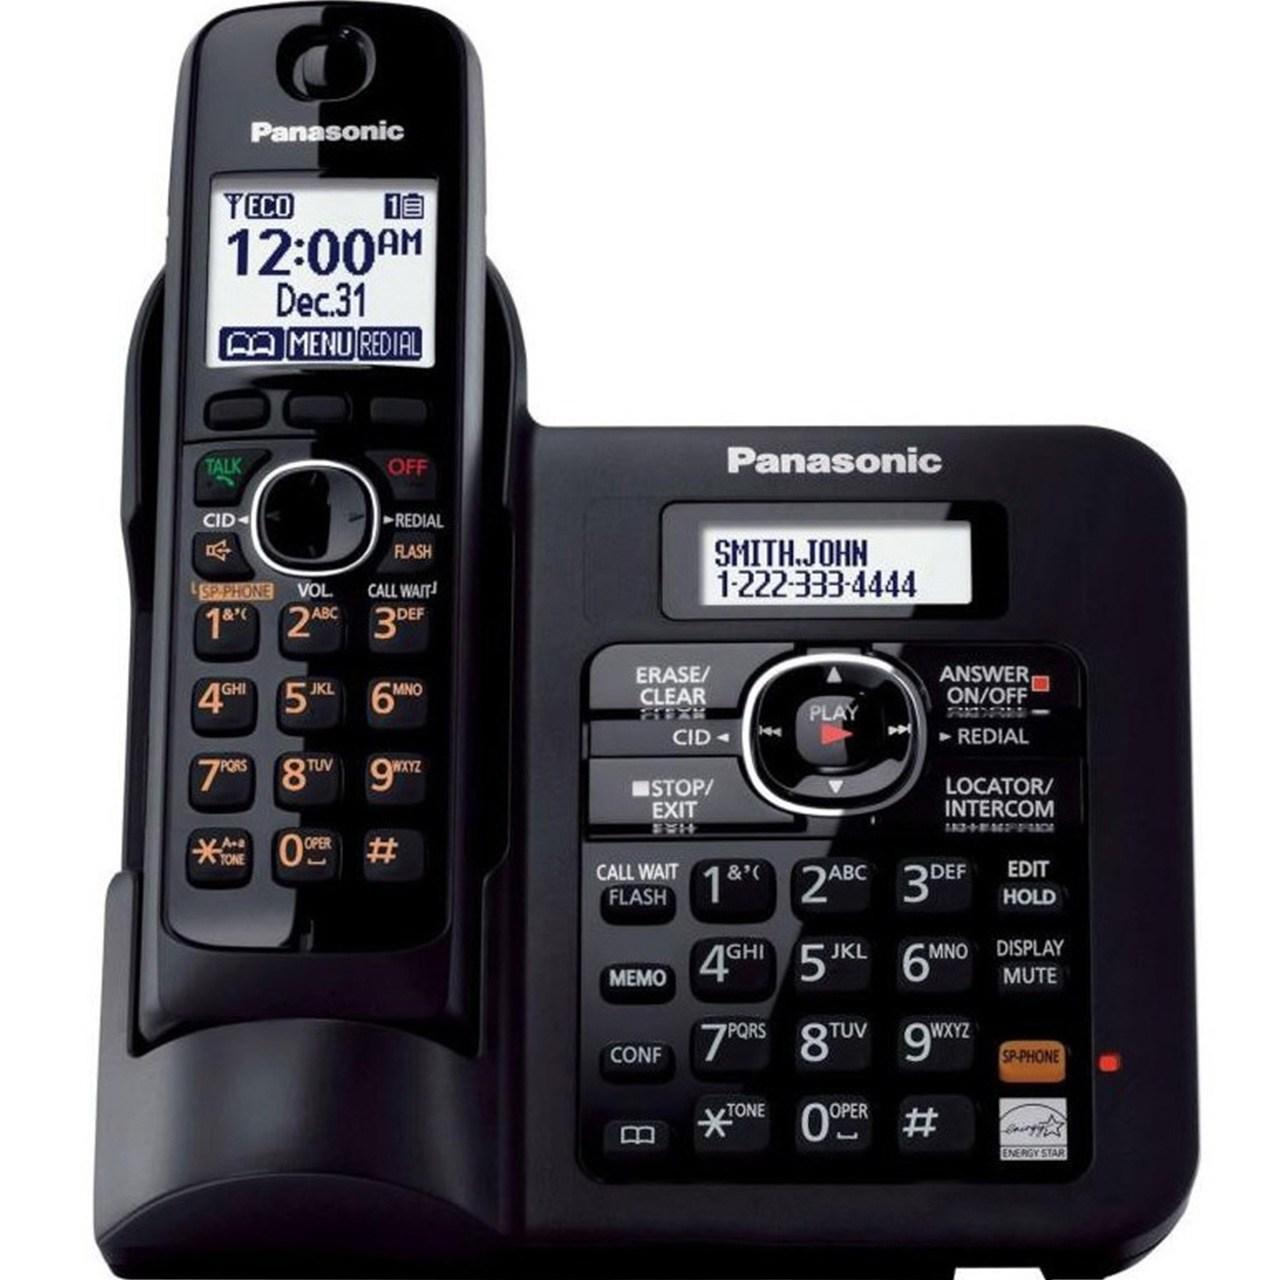 خرید اینترنتی تلفن بی سیم پاناسونیک مدل KX-TG3821BX